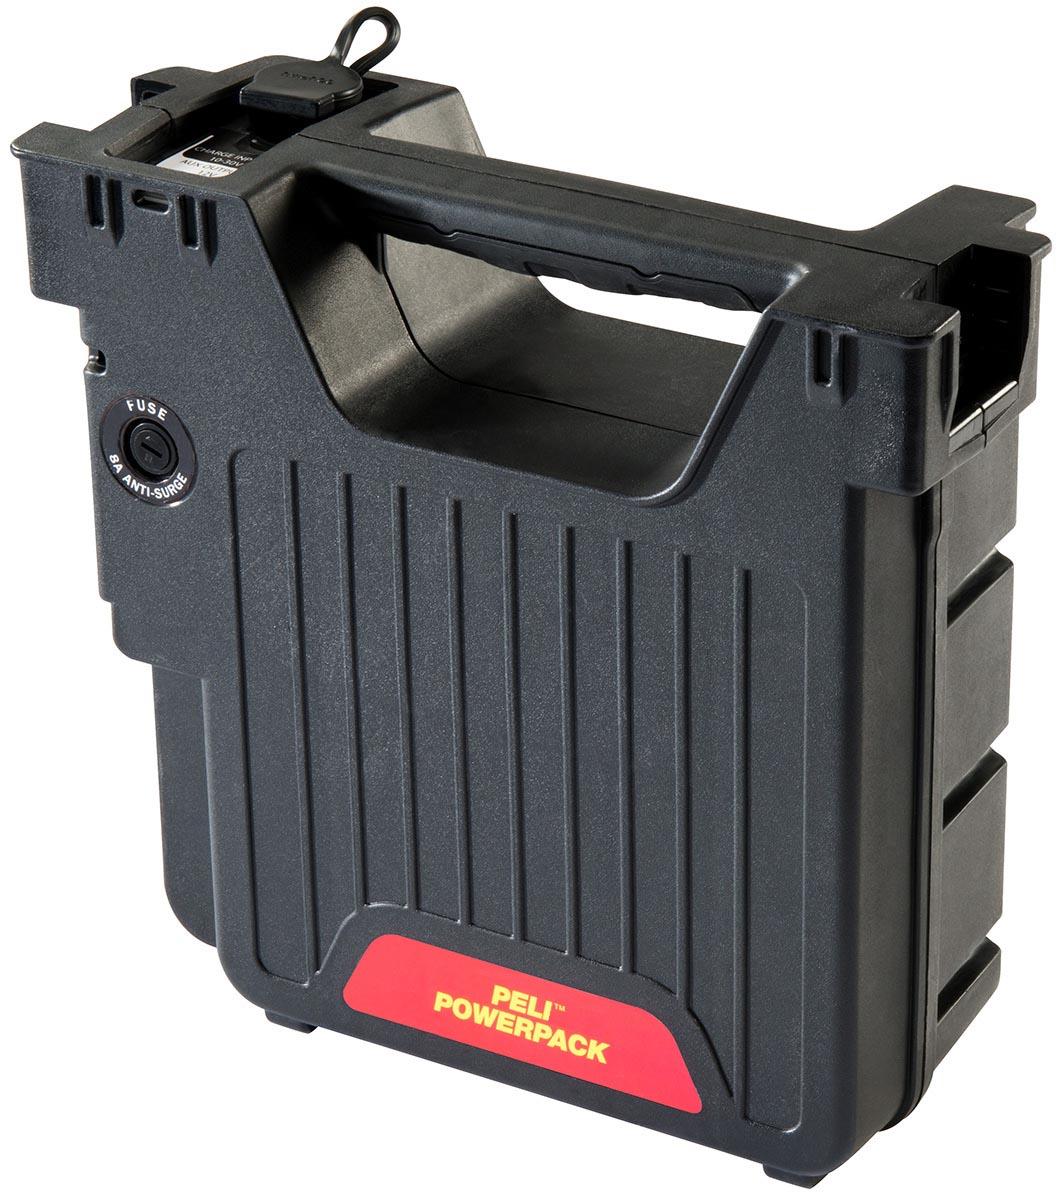 peli 9489 rals powerpack battery